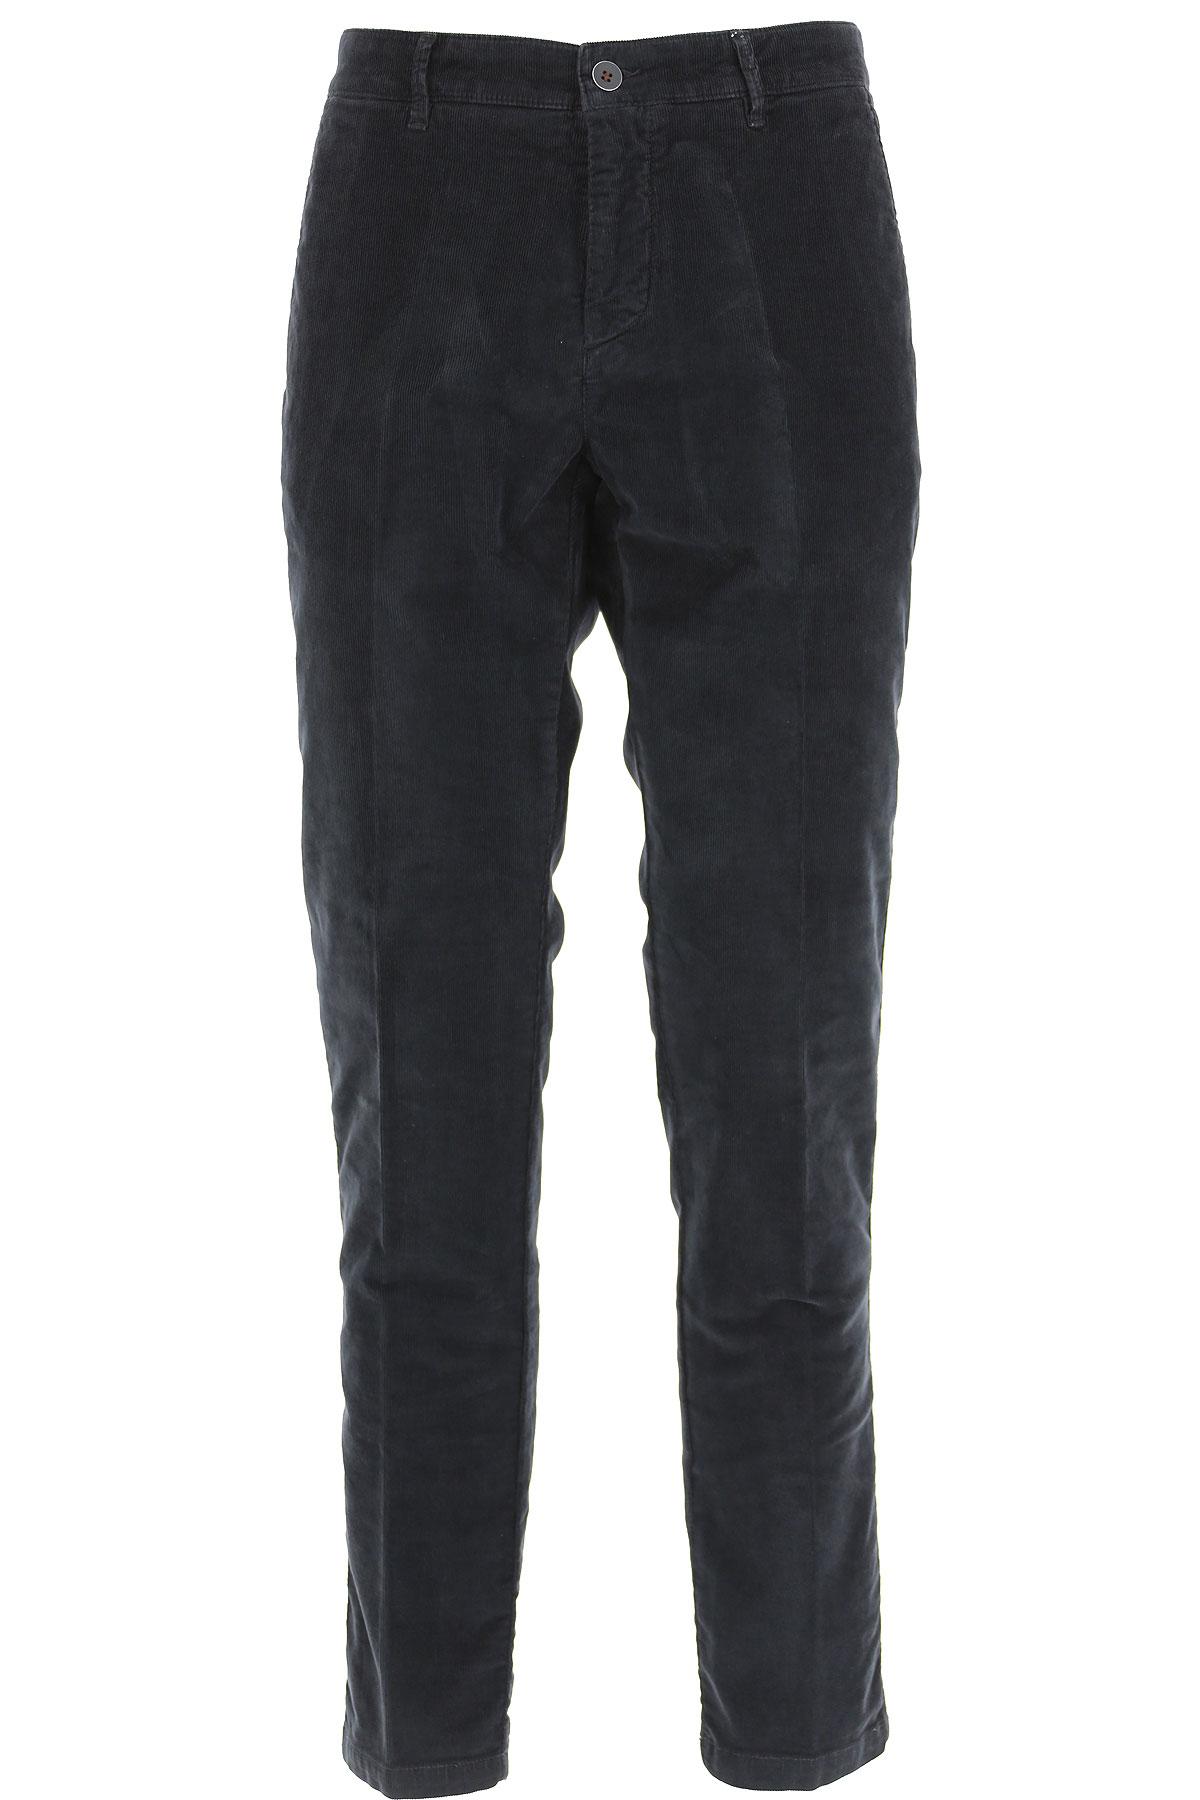 Brooksfield Jacket for Men On Sale, Blue Dark, Cotton, 2019, L M XL XXL